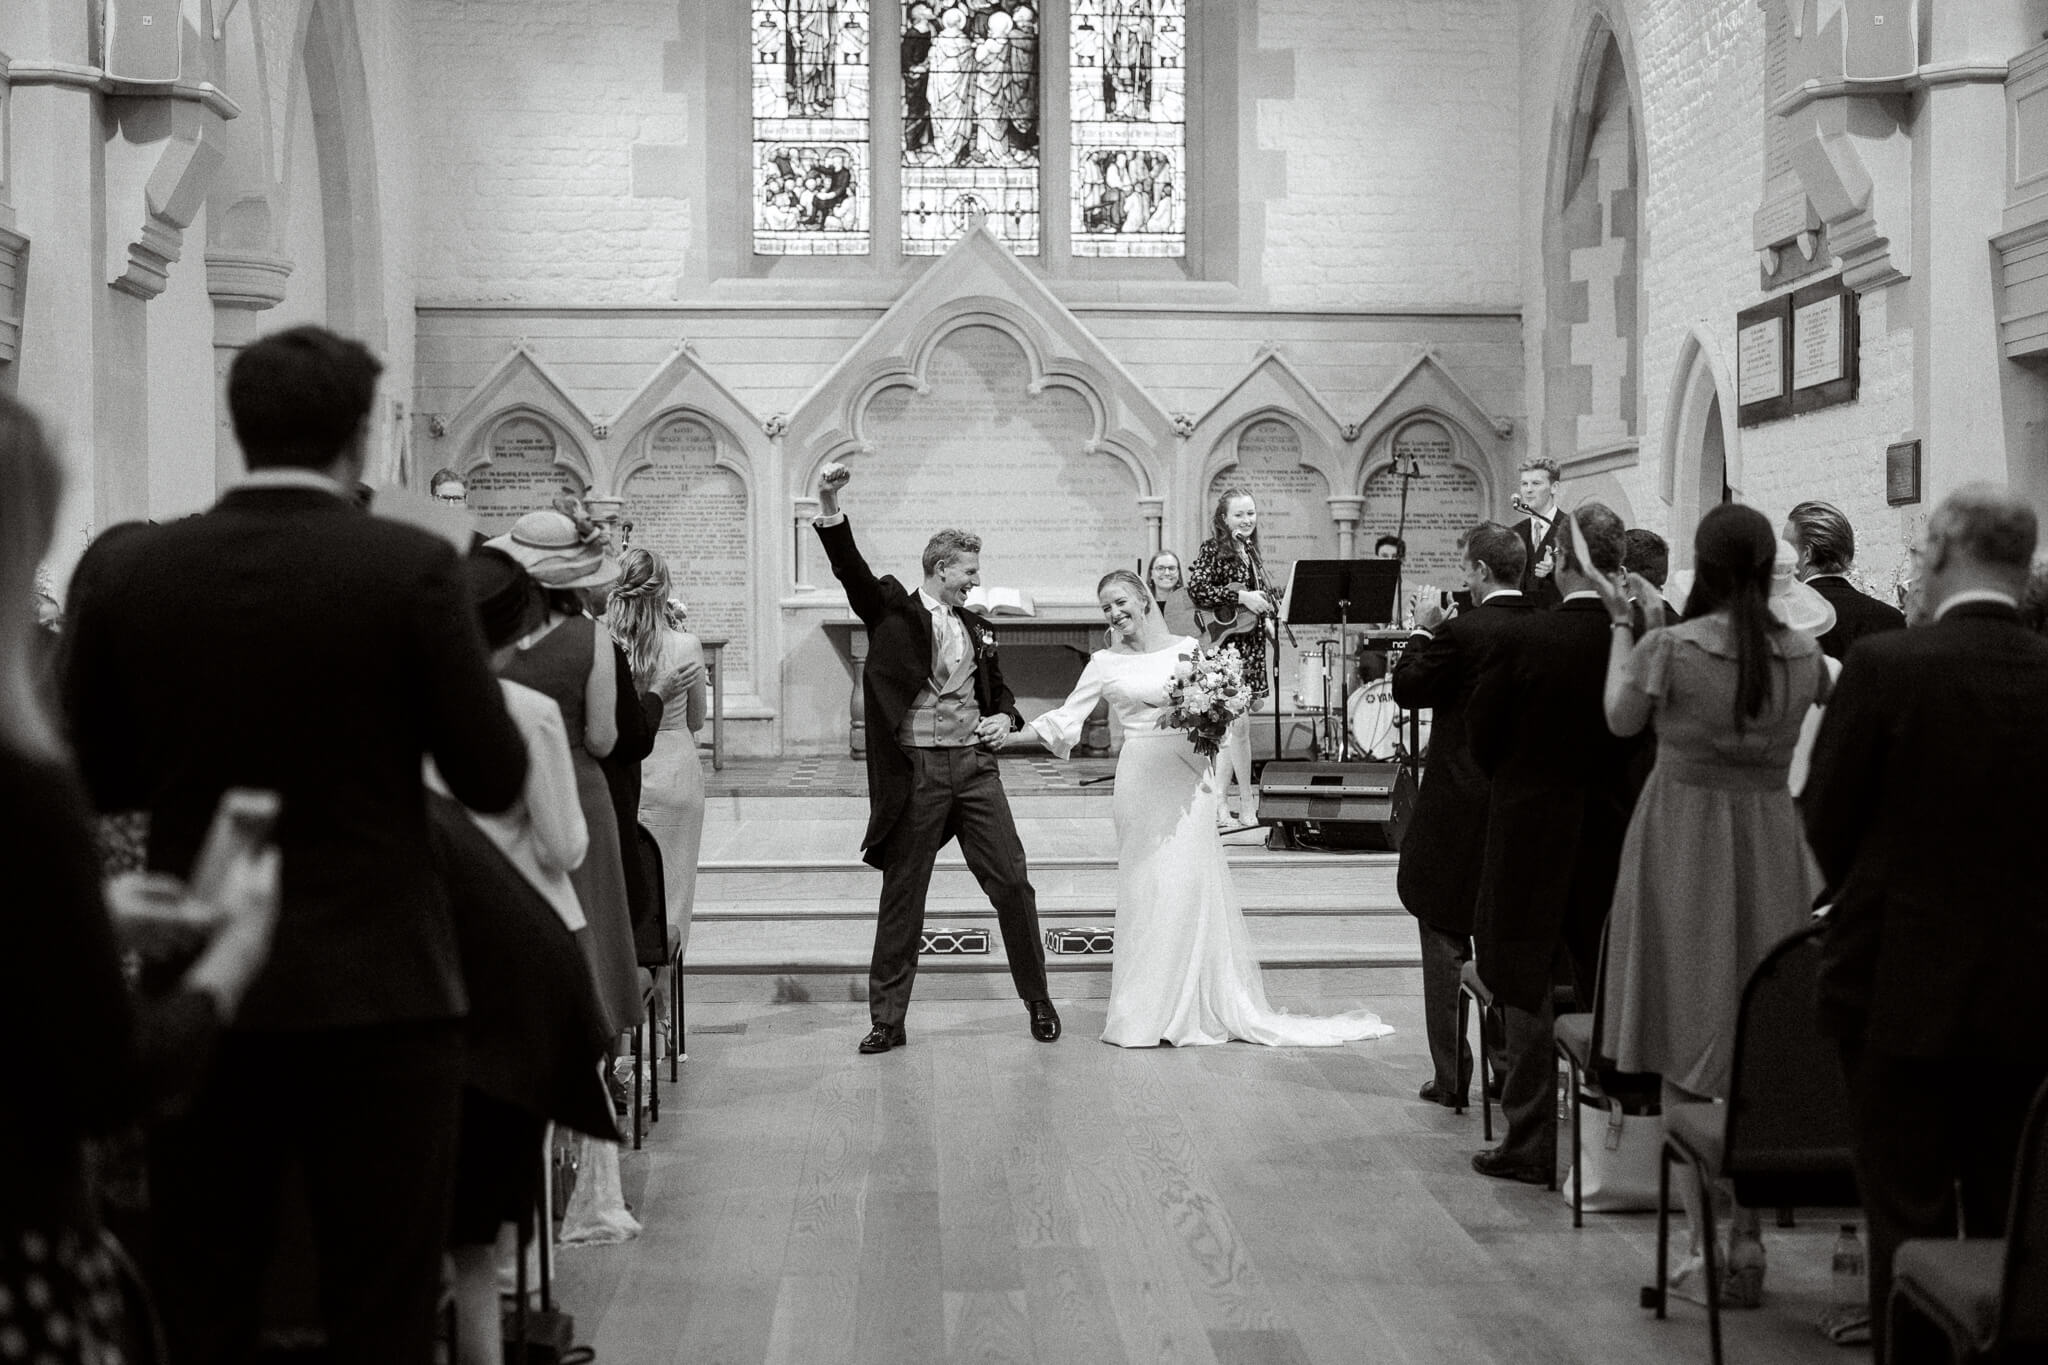 St Ebbs Church wedding ceremony in Oxford city